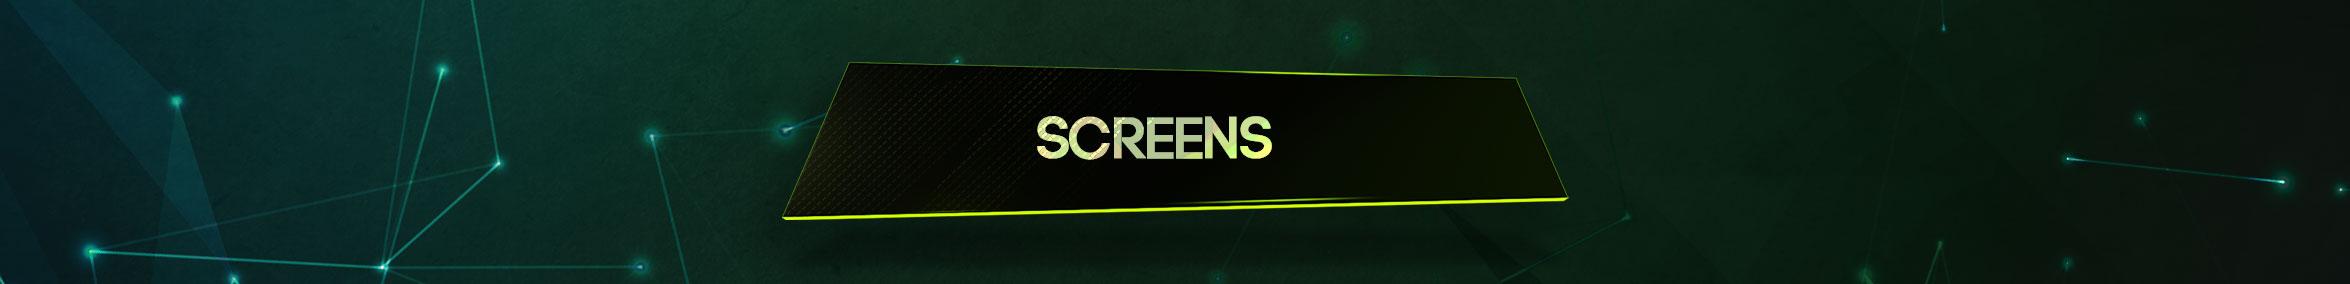 twitch screens